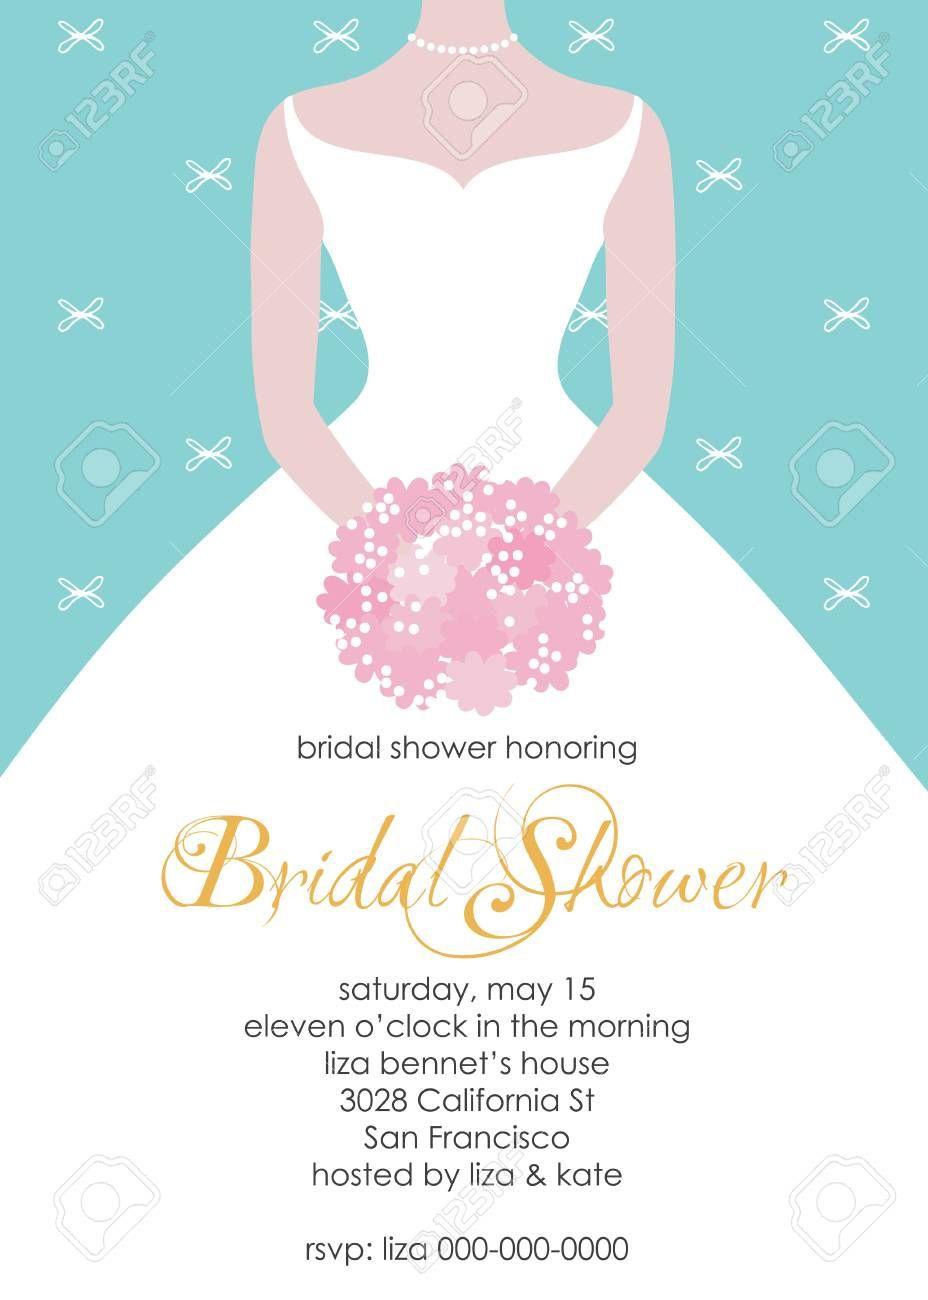 Bridal Shower Invitation Template Wedding Fashion Vecto In 2020 Bridal Shower Invitations Printable Bridal Shower Invitation Cards Bridal Shower Invitations Templates